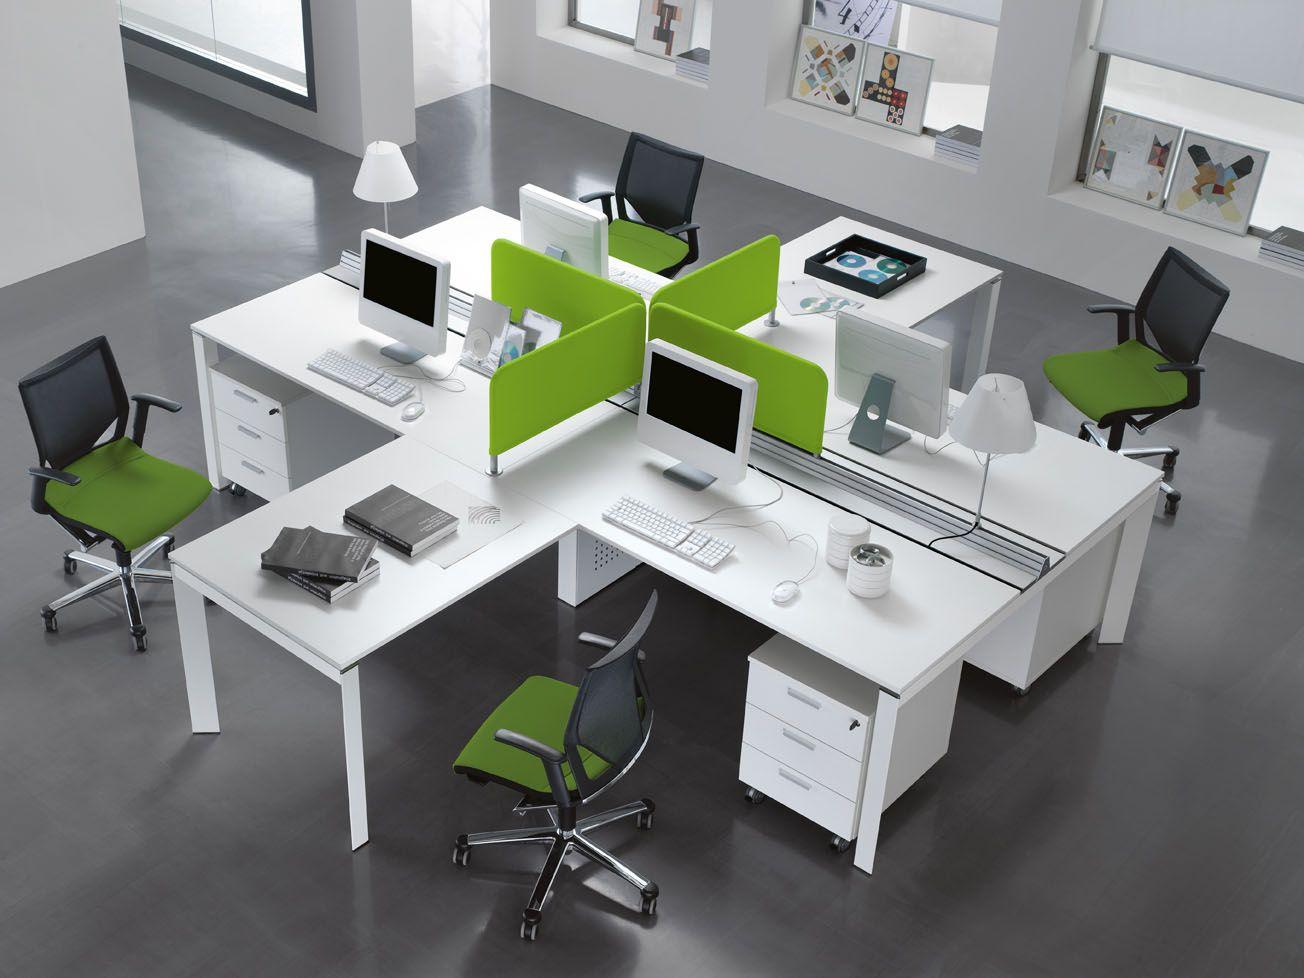 Mobili rio operativo entity simbologia for Diseno de escritorios de oficina